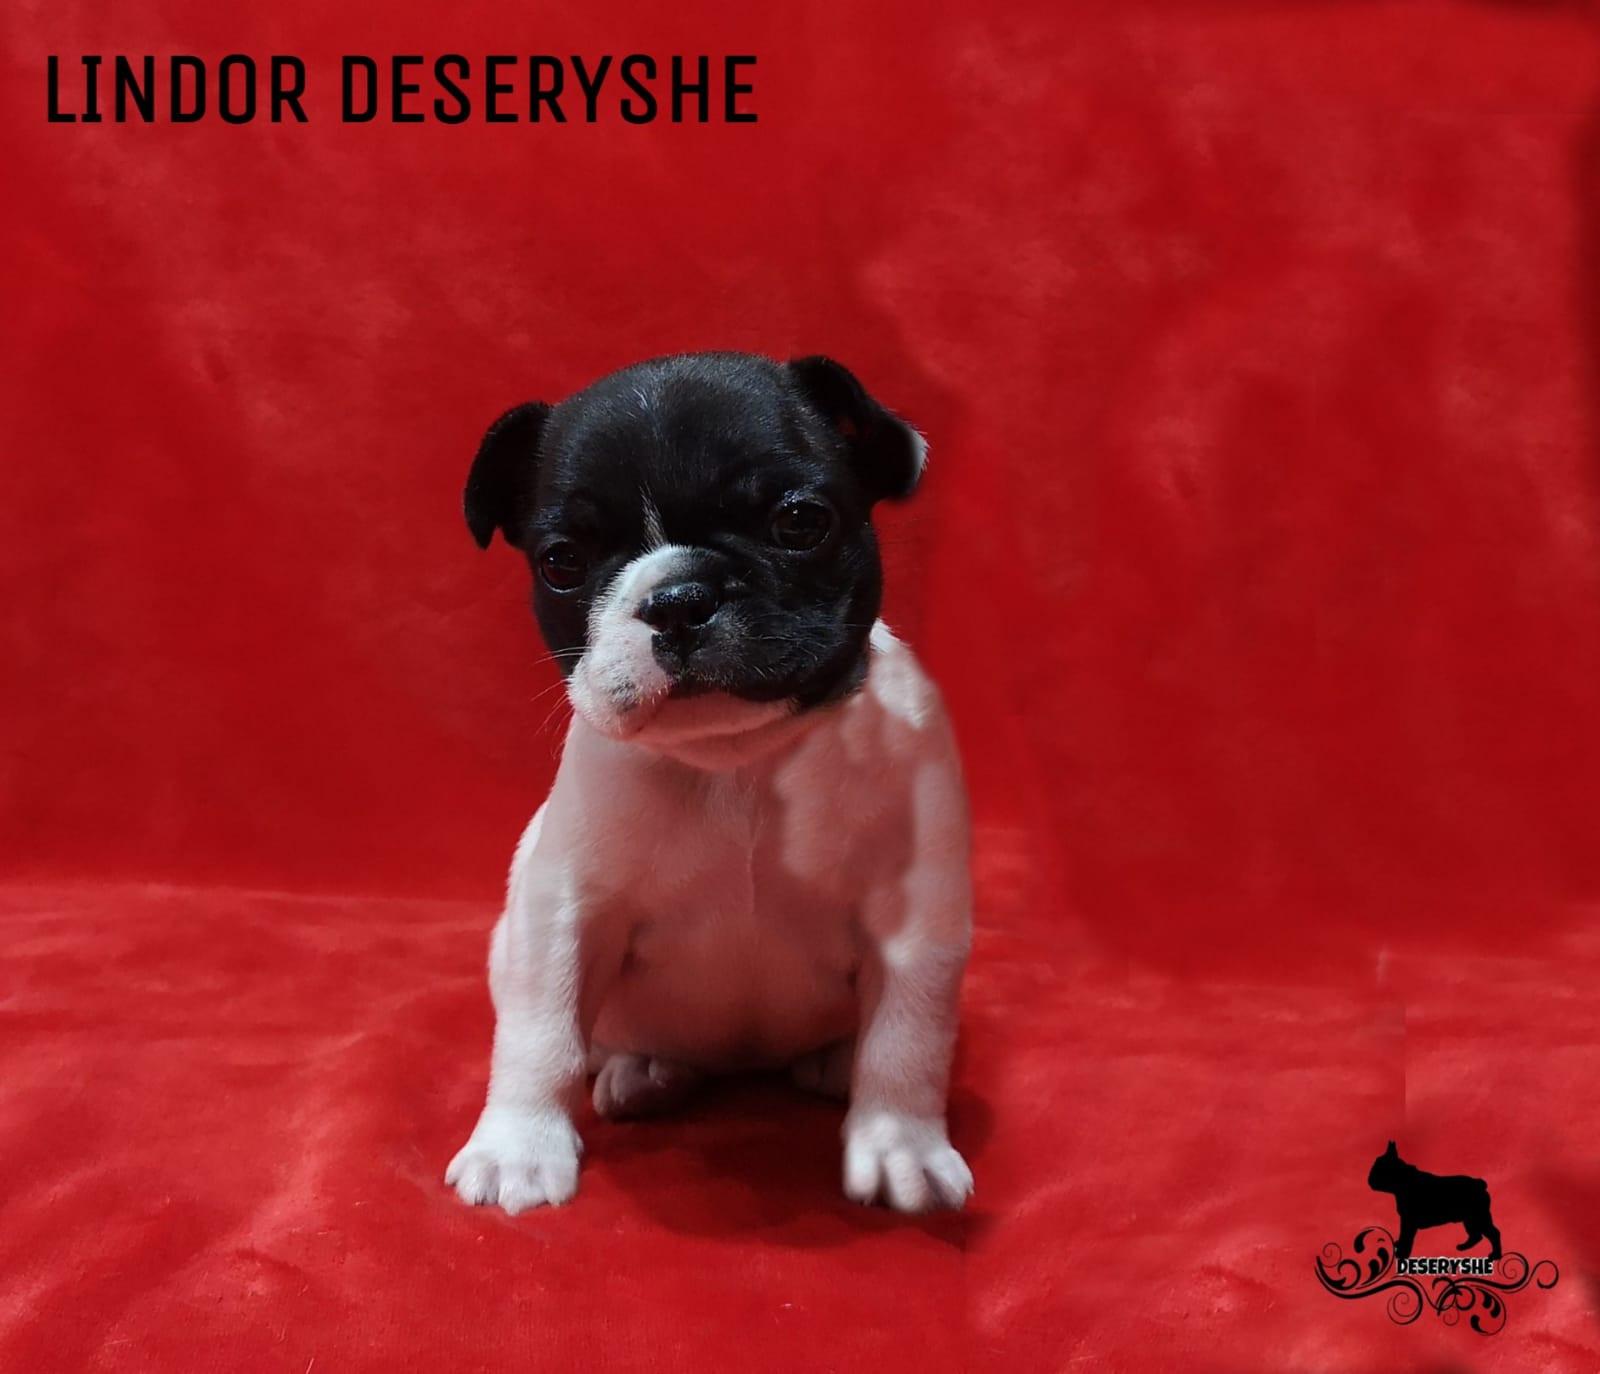 LINDOR DESERYSHE PUPPY